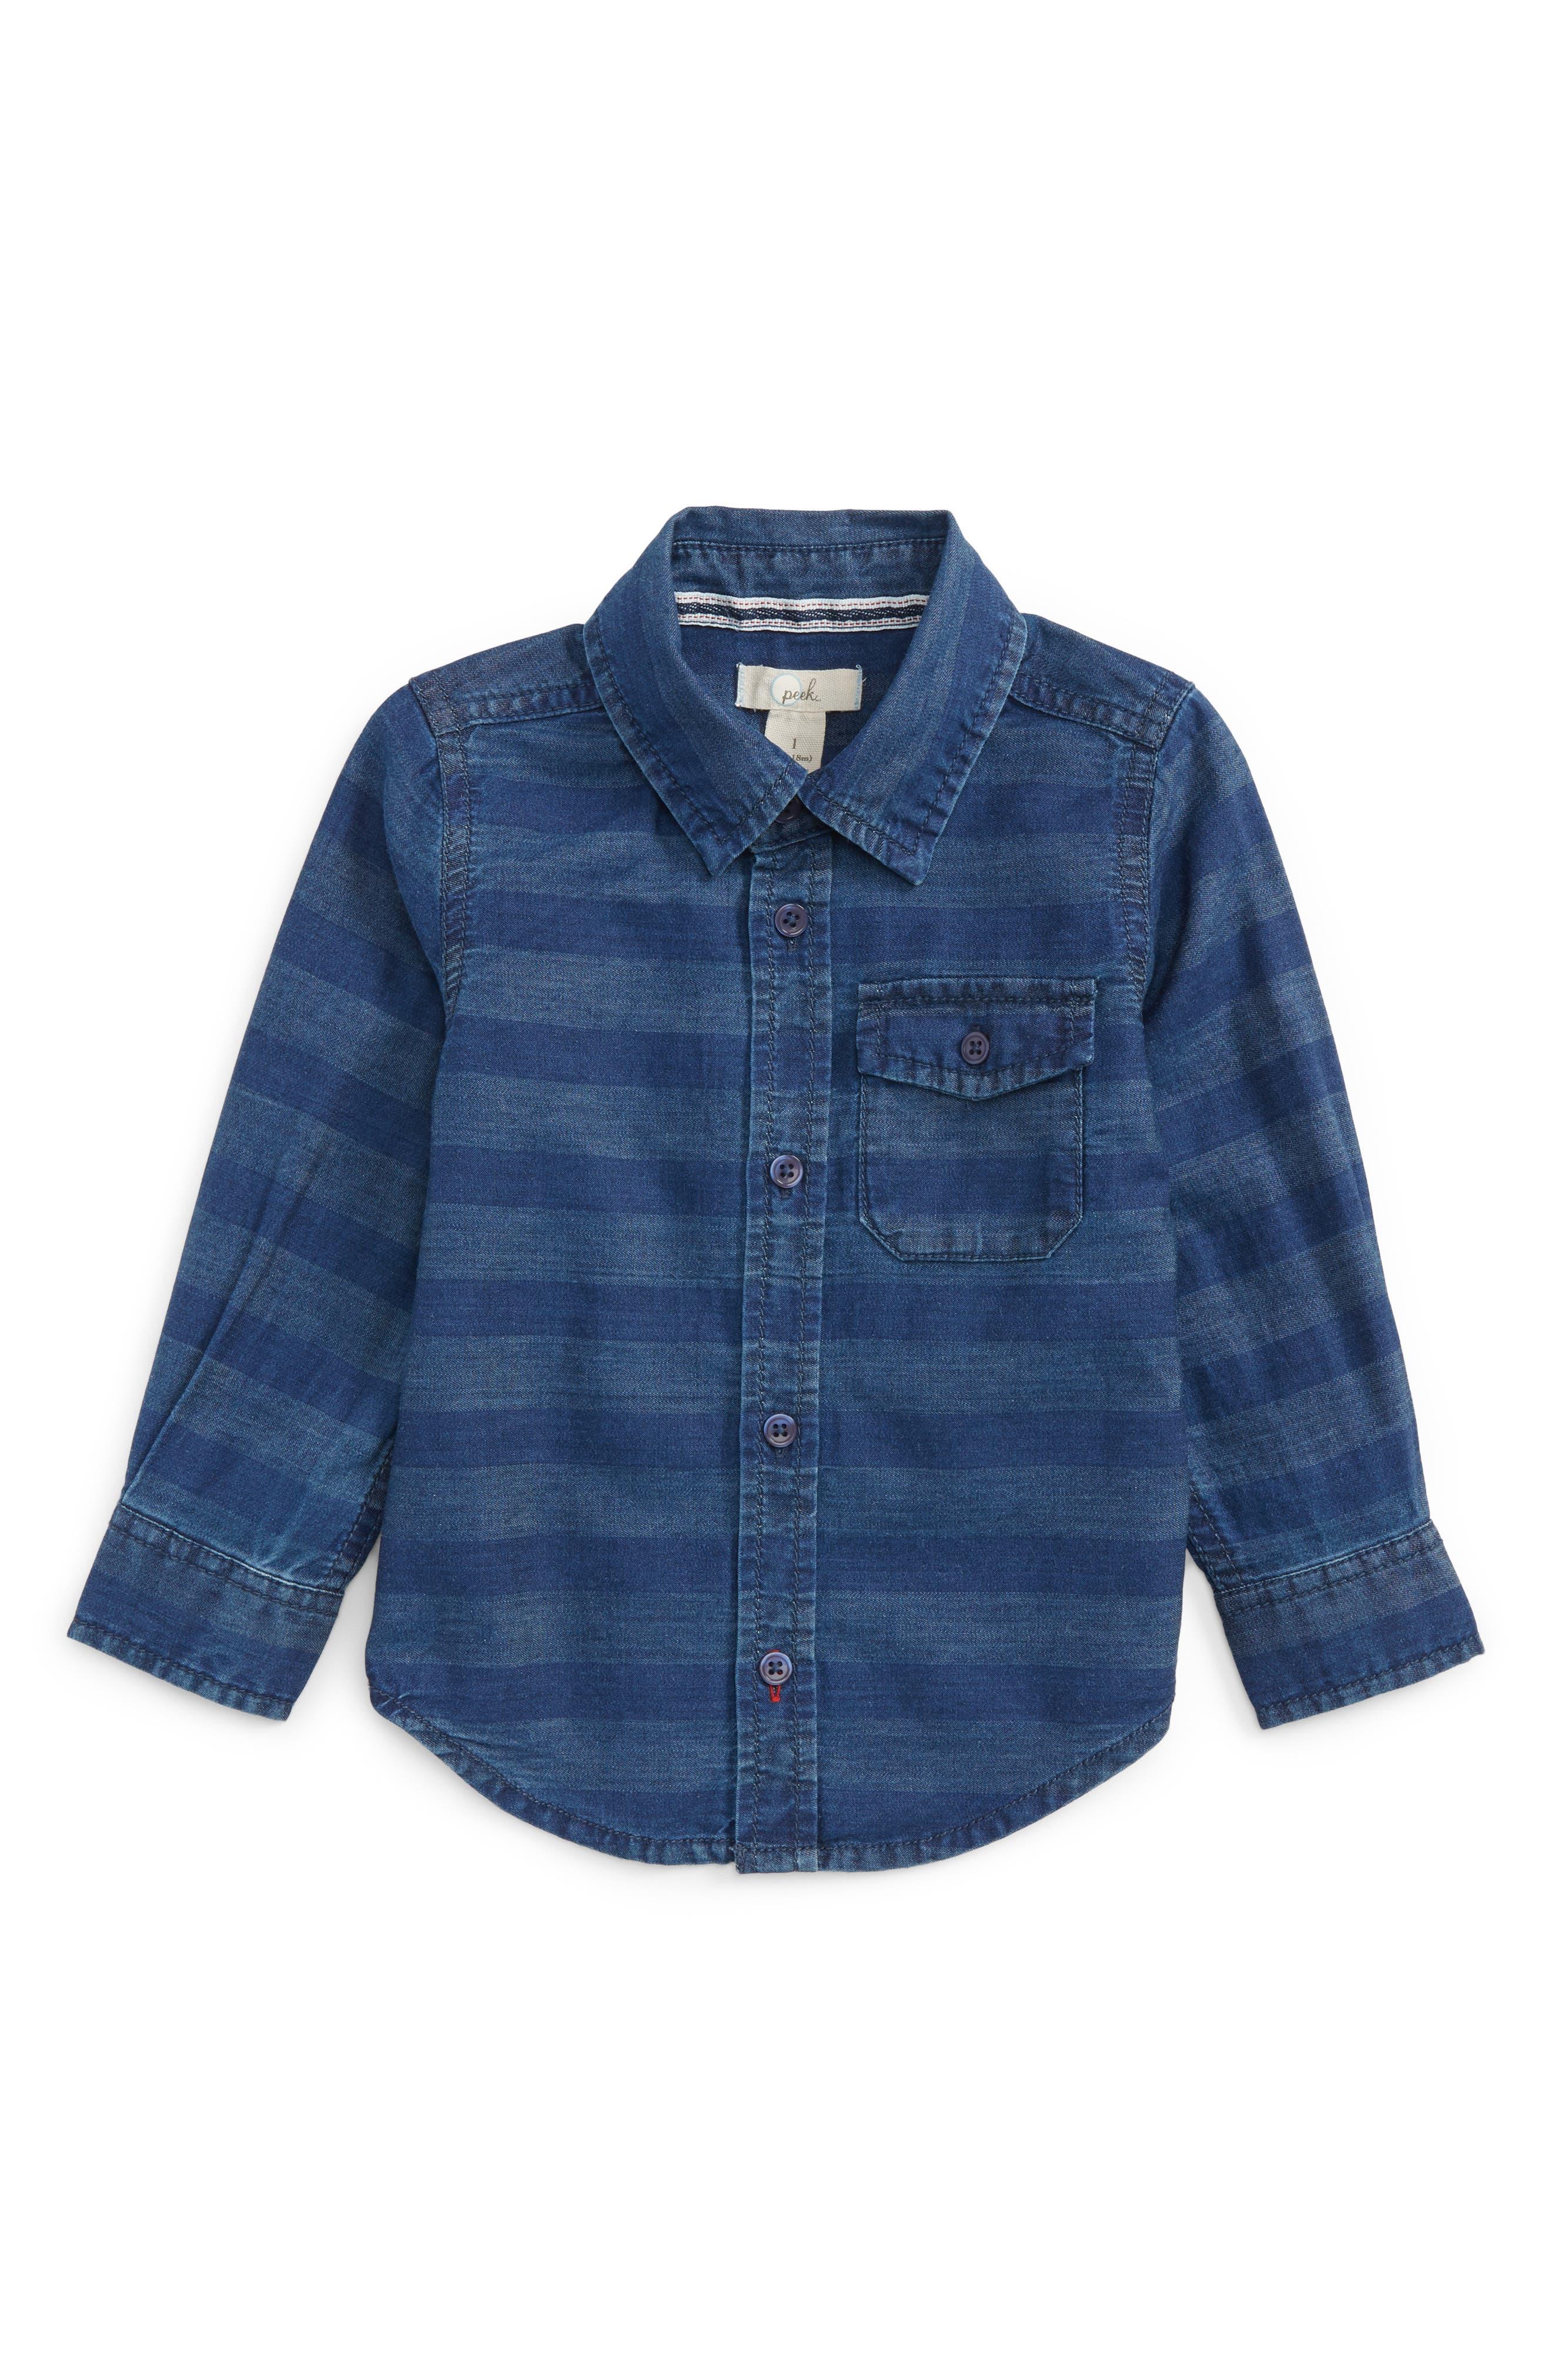 Peek Aiden Stripe Chambray Shirt (Baby Boys)